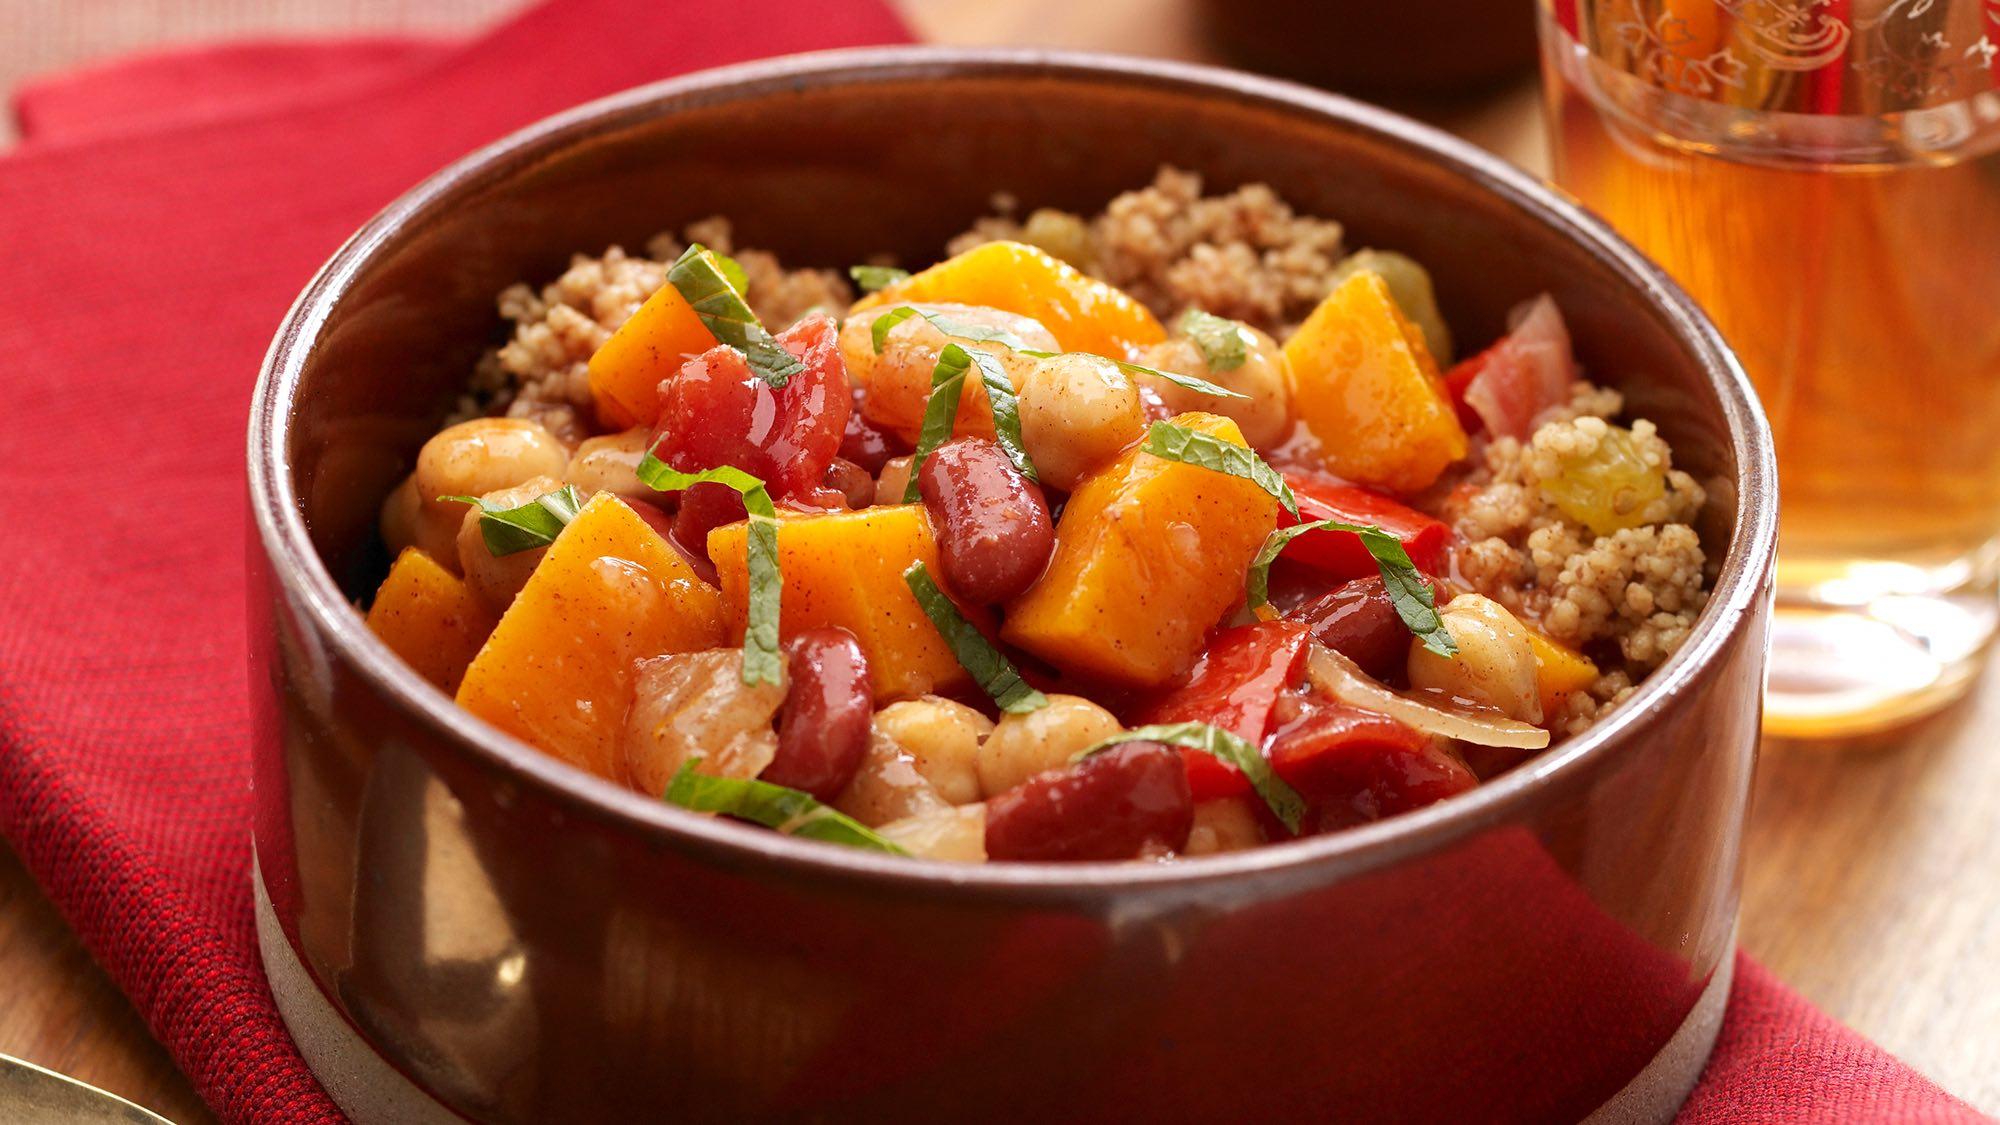 moroccan-bean-and-pepper-stew.jpg